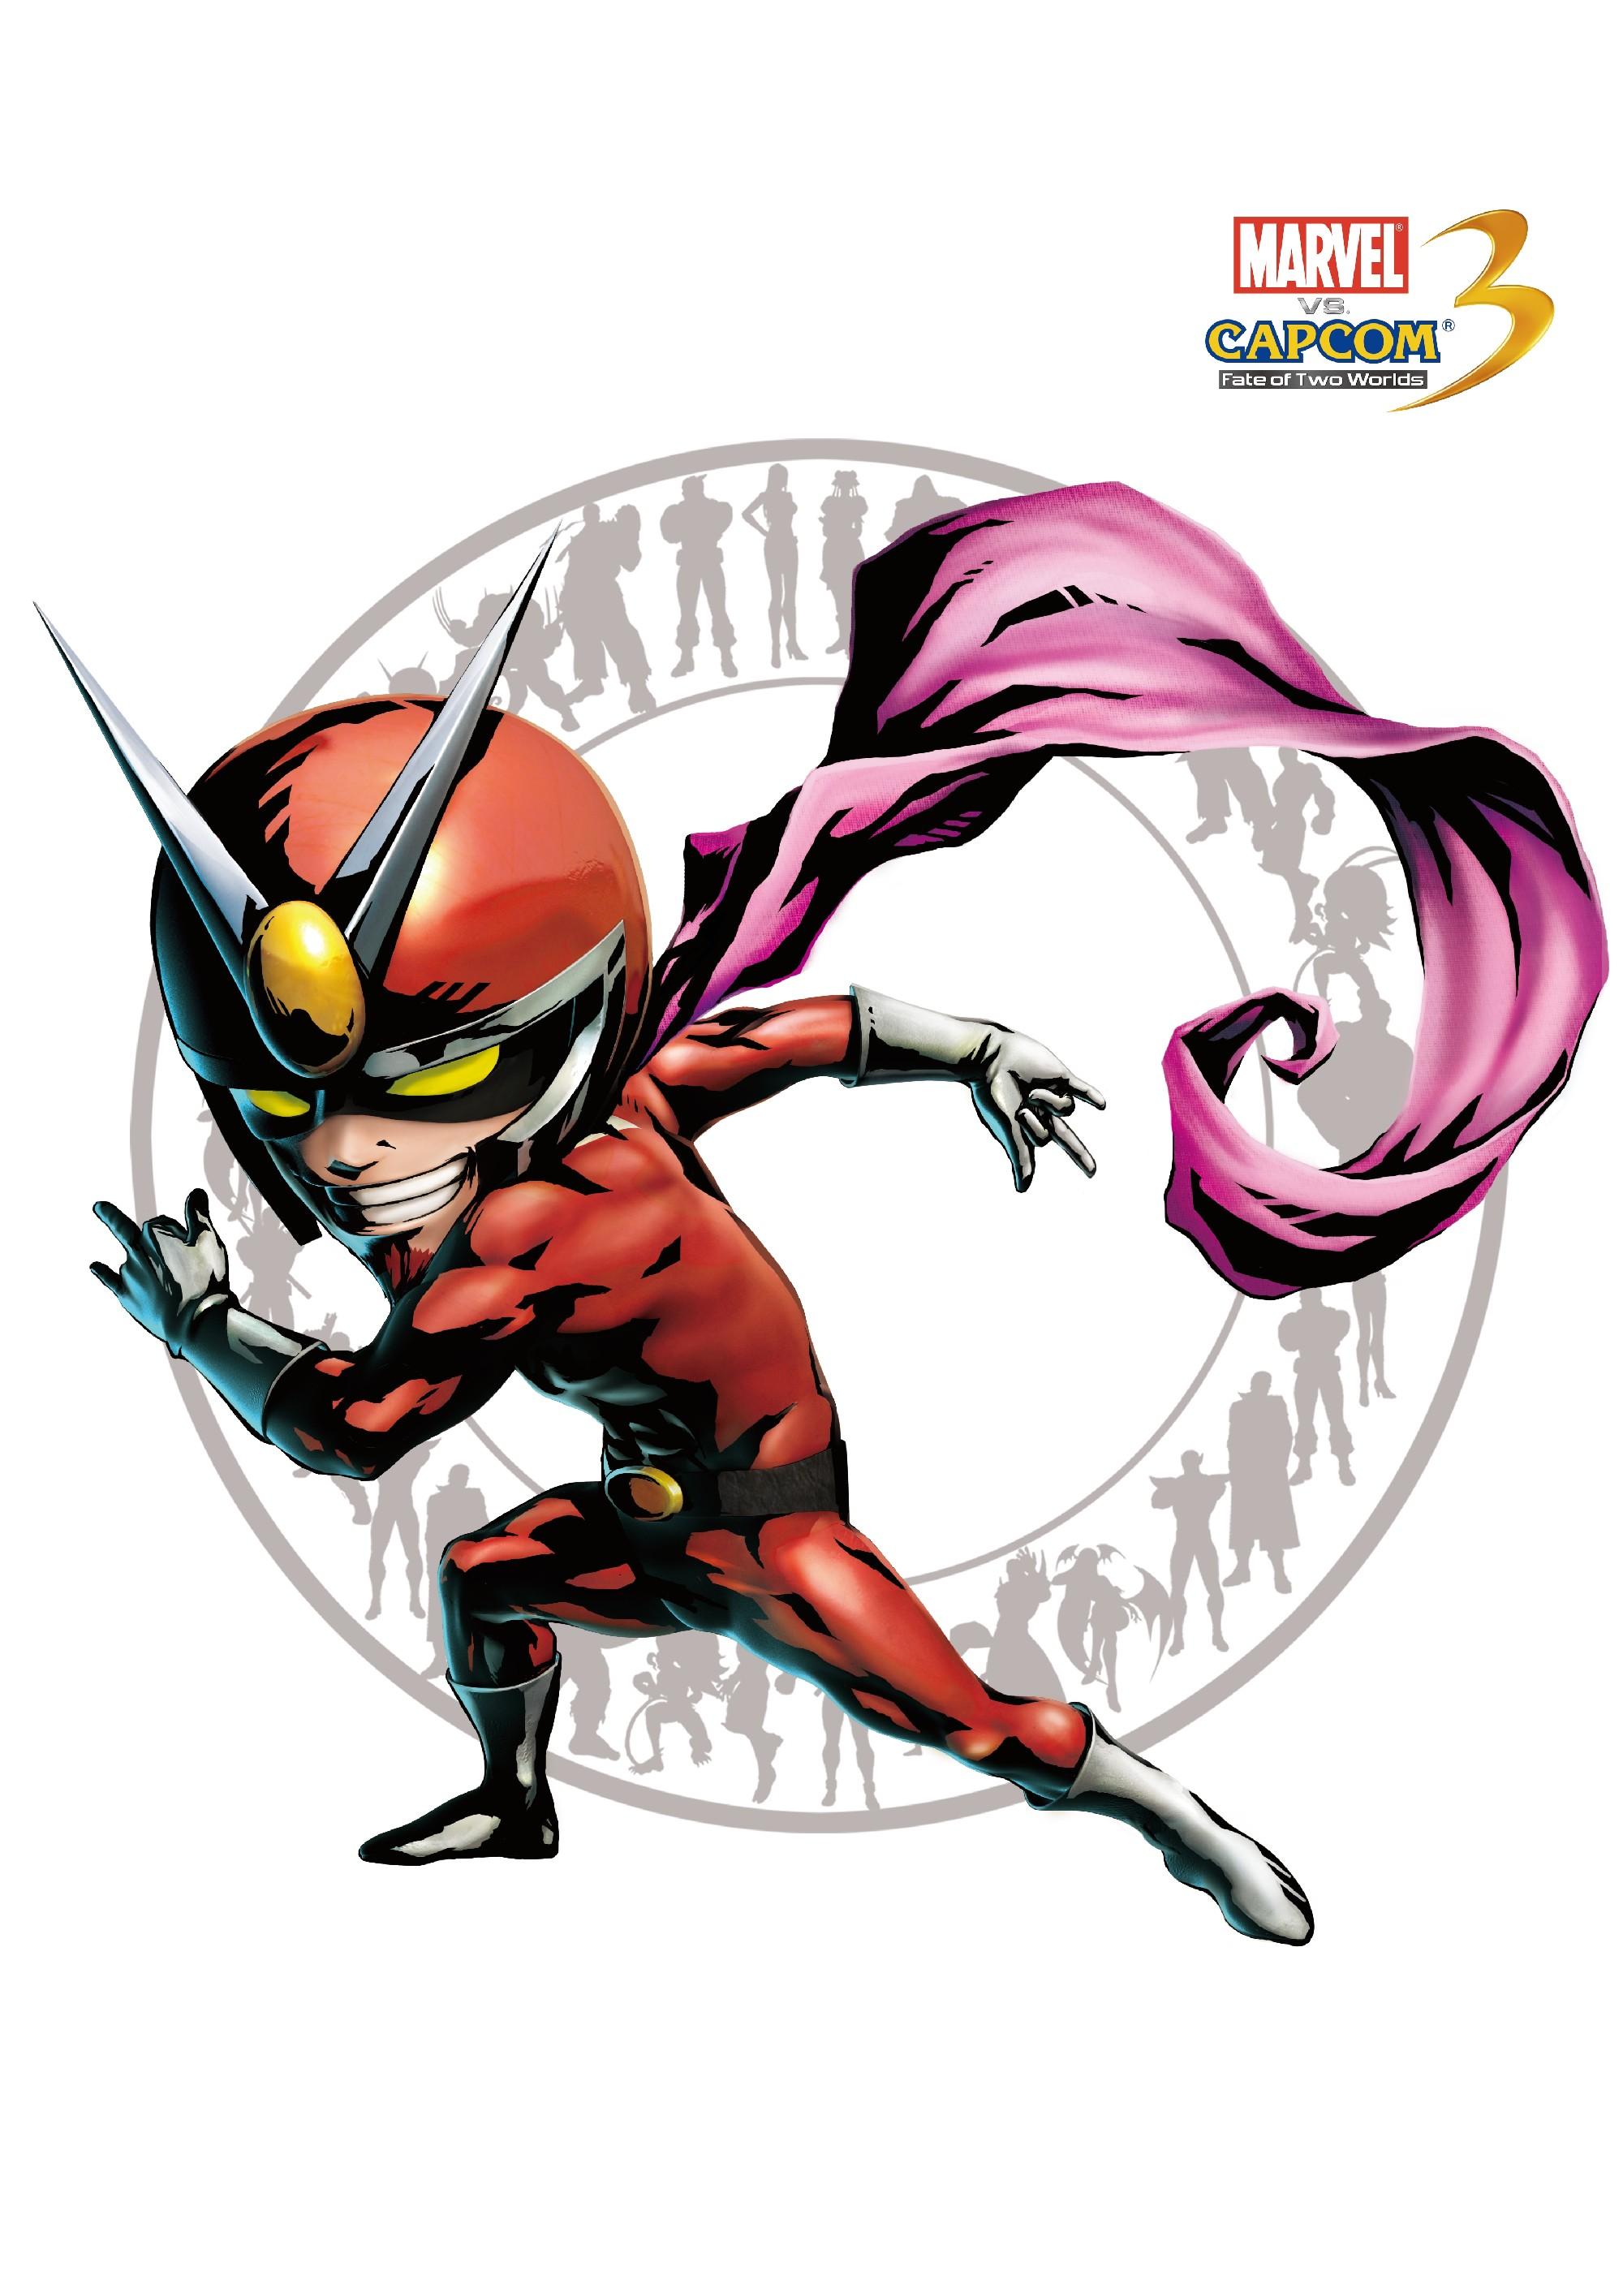 Красавчик Джо - Marvel vs. Capcom 3: Fate of Two Worlds Арт, Персонаж